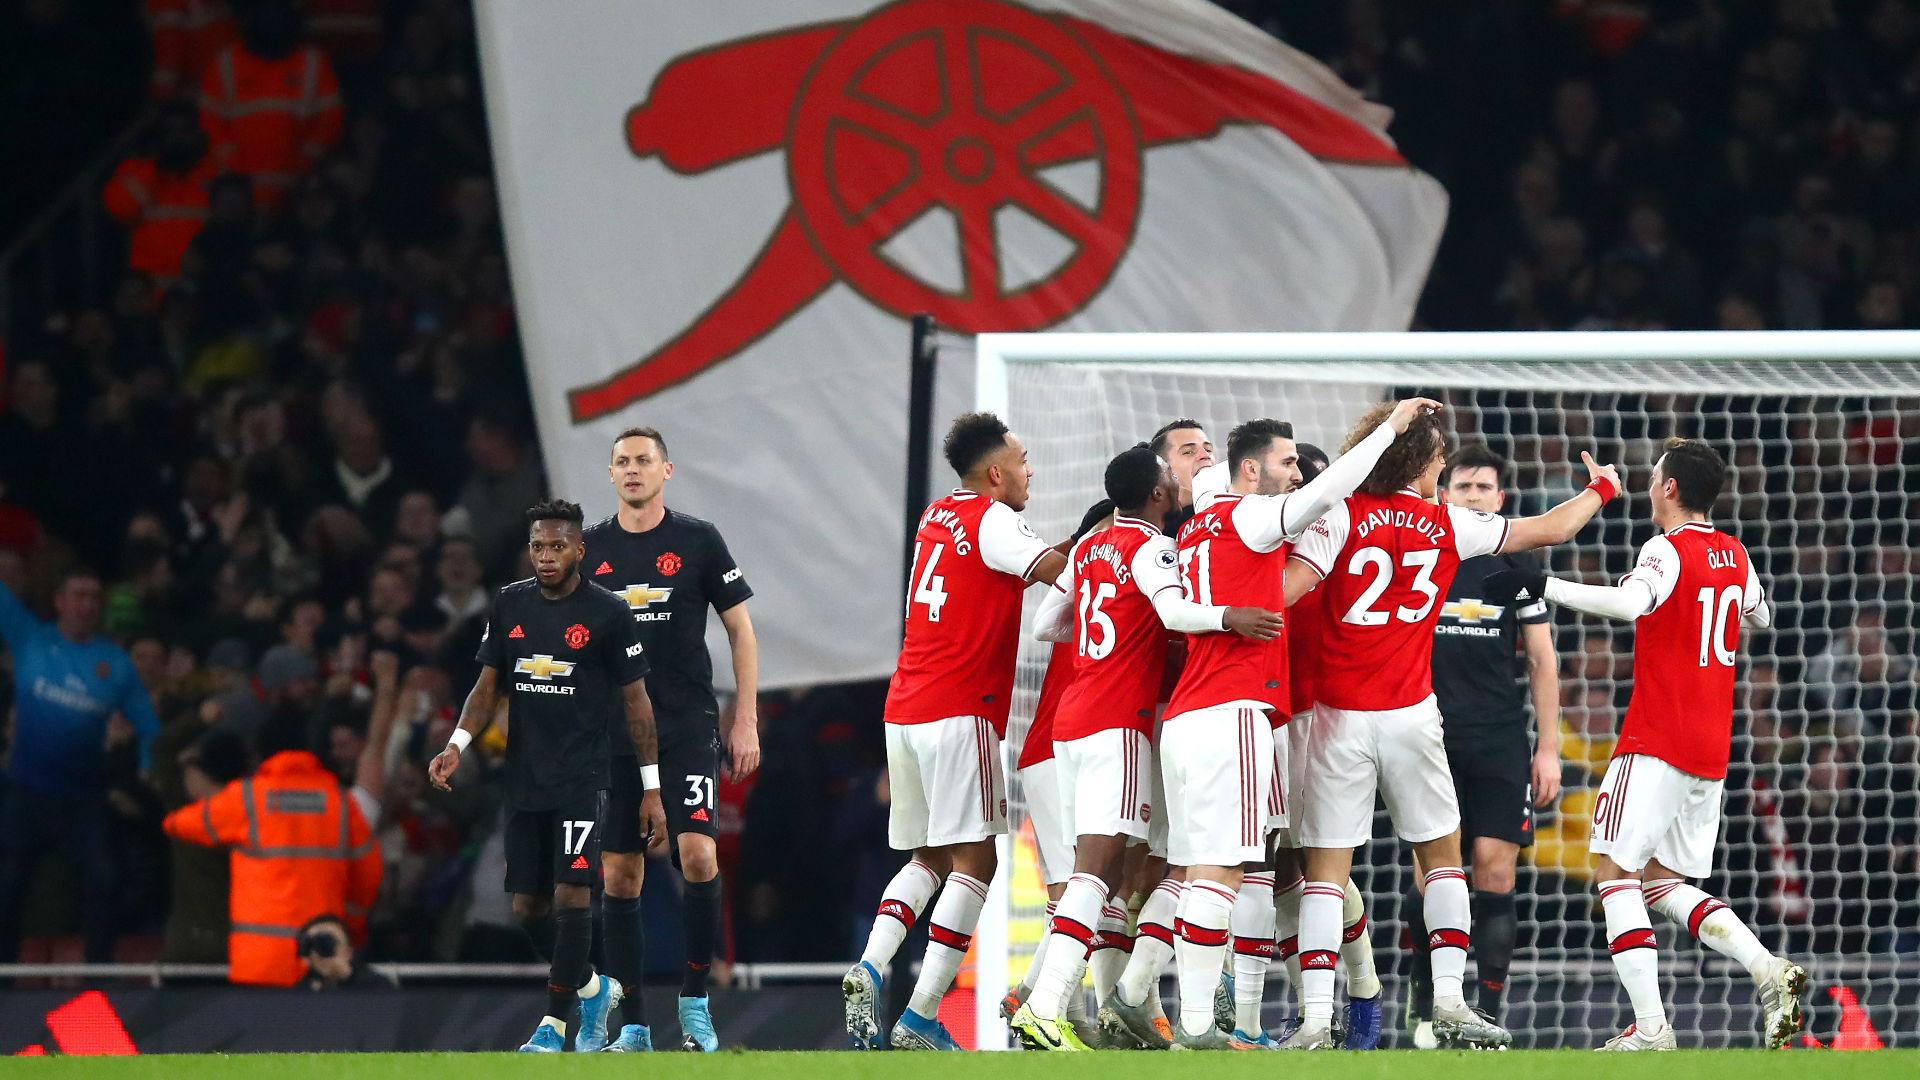 Laporan Pertandingan Liga Primer Inggris Arsenal 2 0